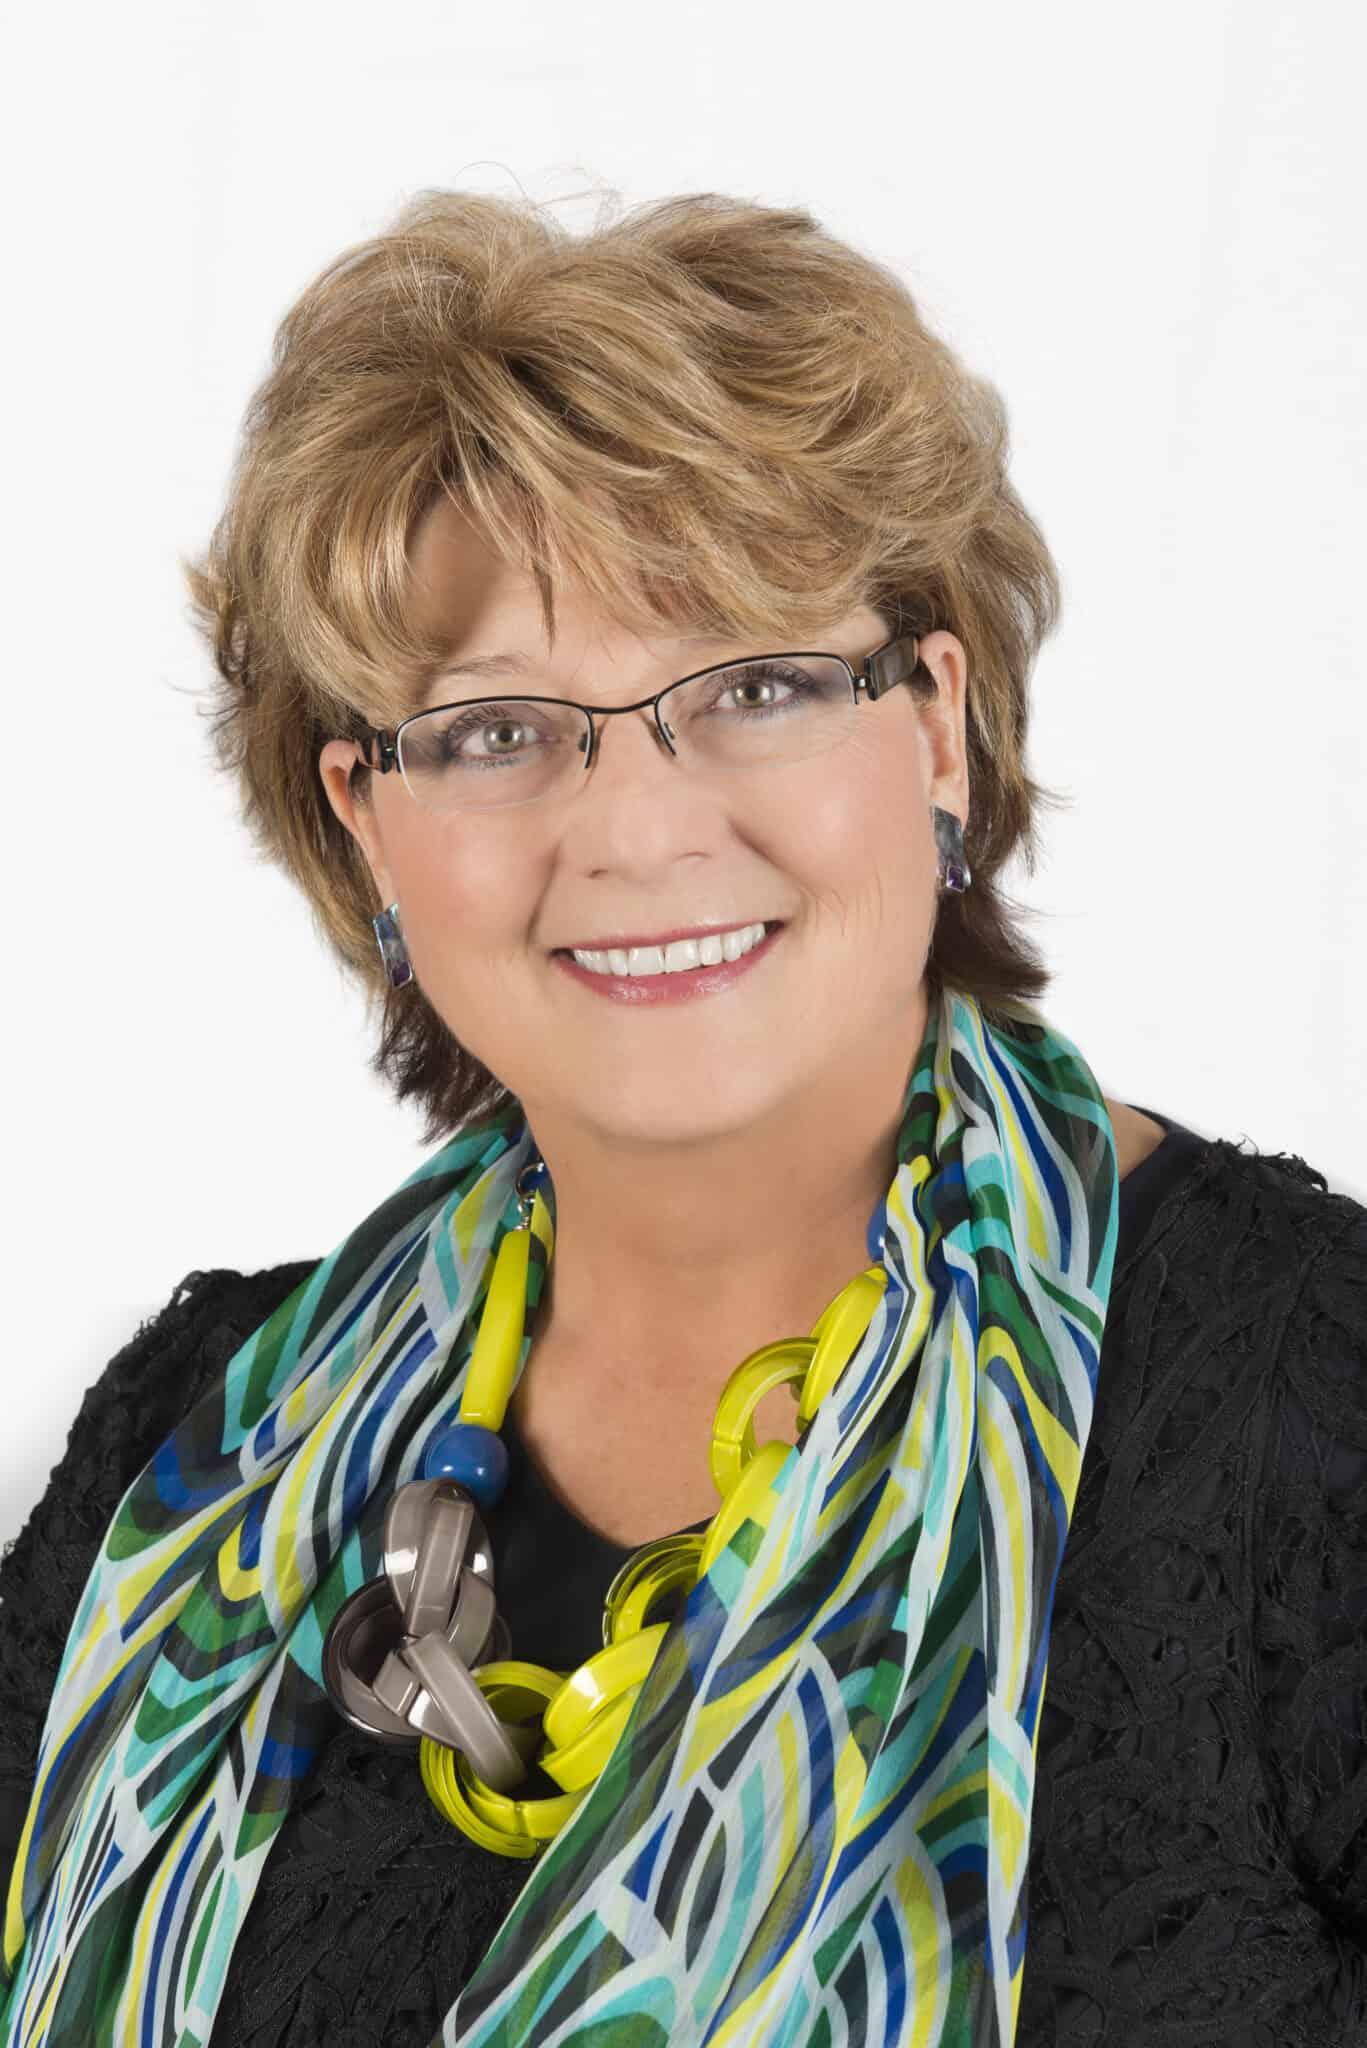 Kathy Westley